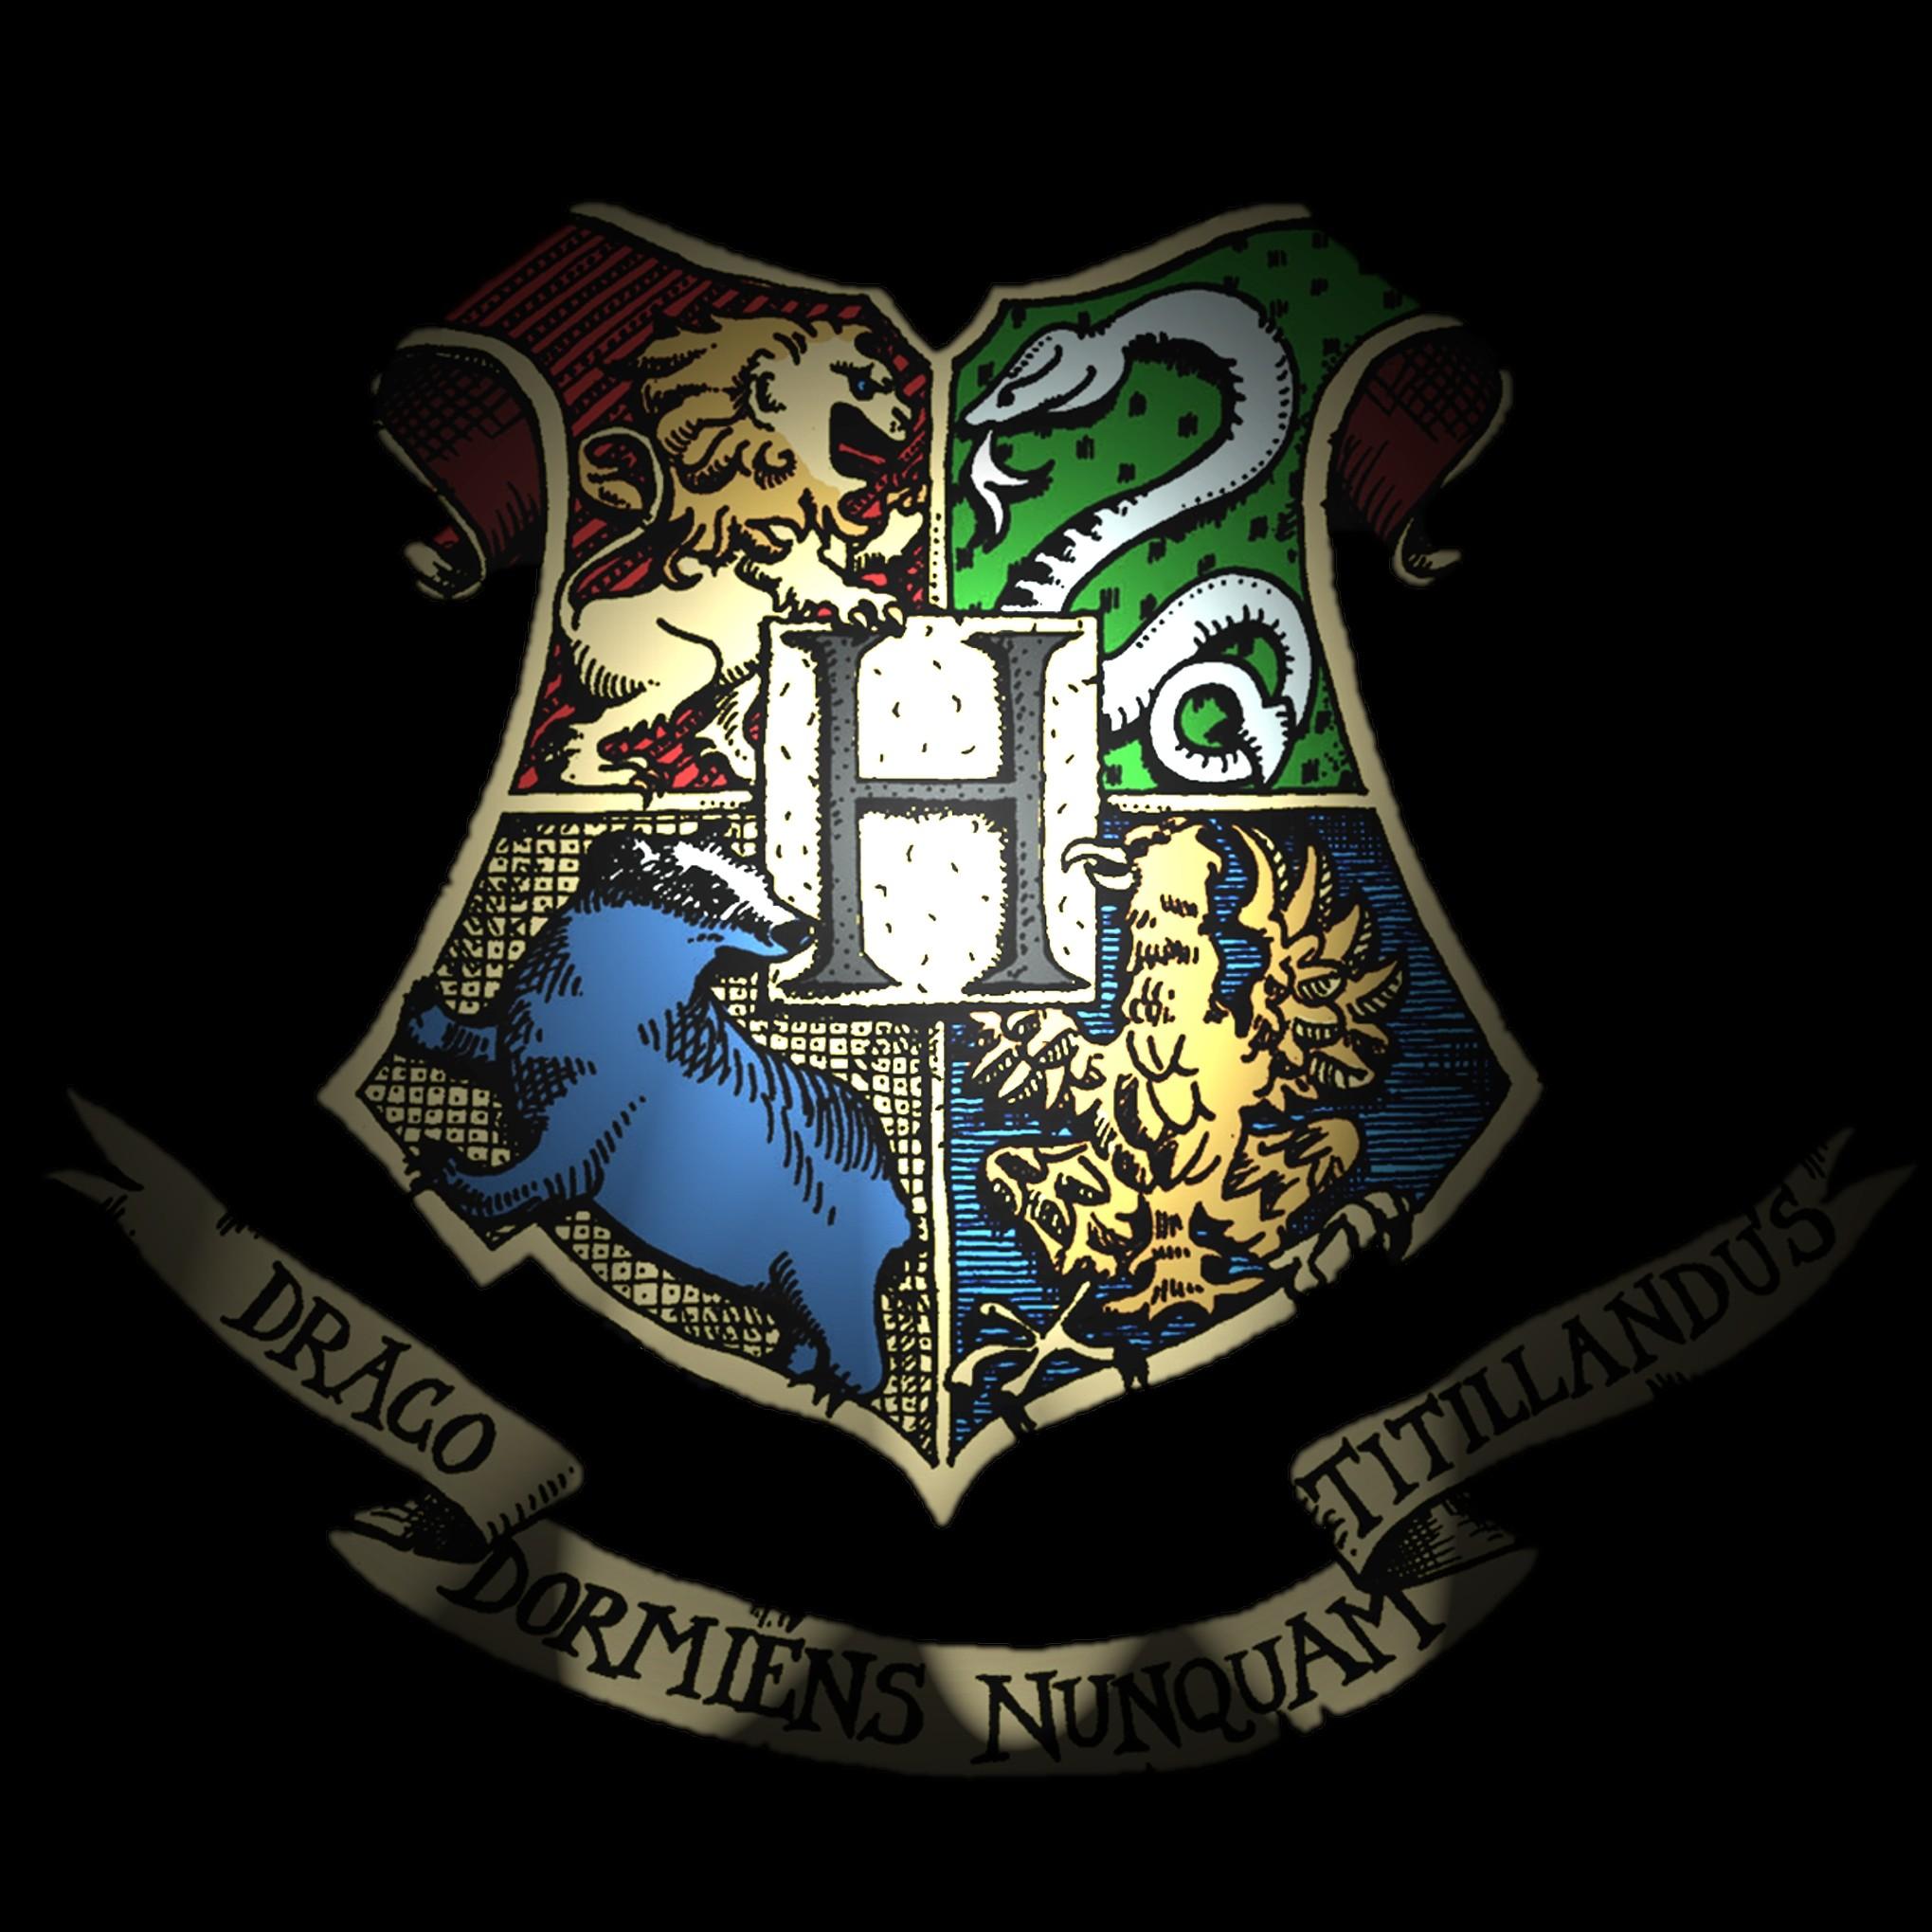 Res: 2039x2039, Harry Potter Hogwarts Crest Wallpaper Harry potter fans can now